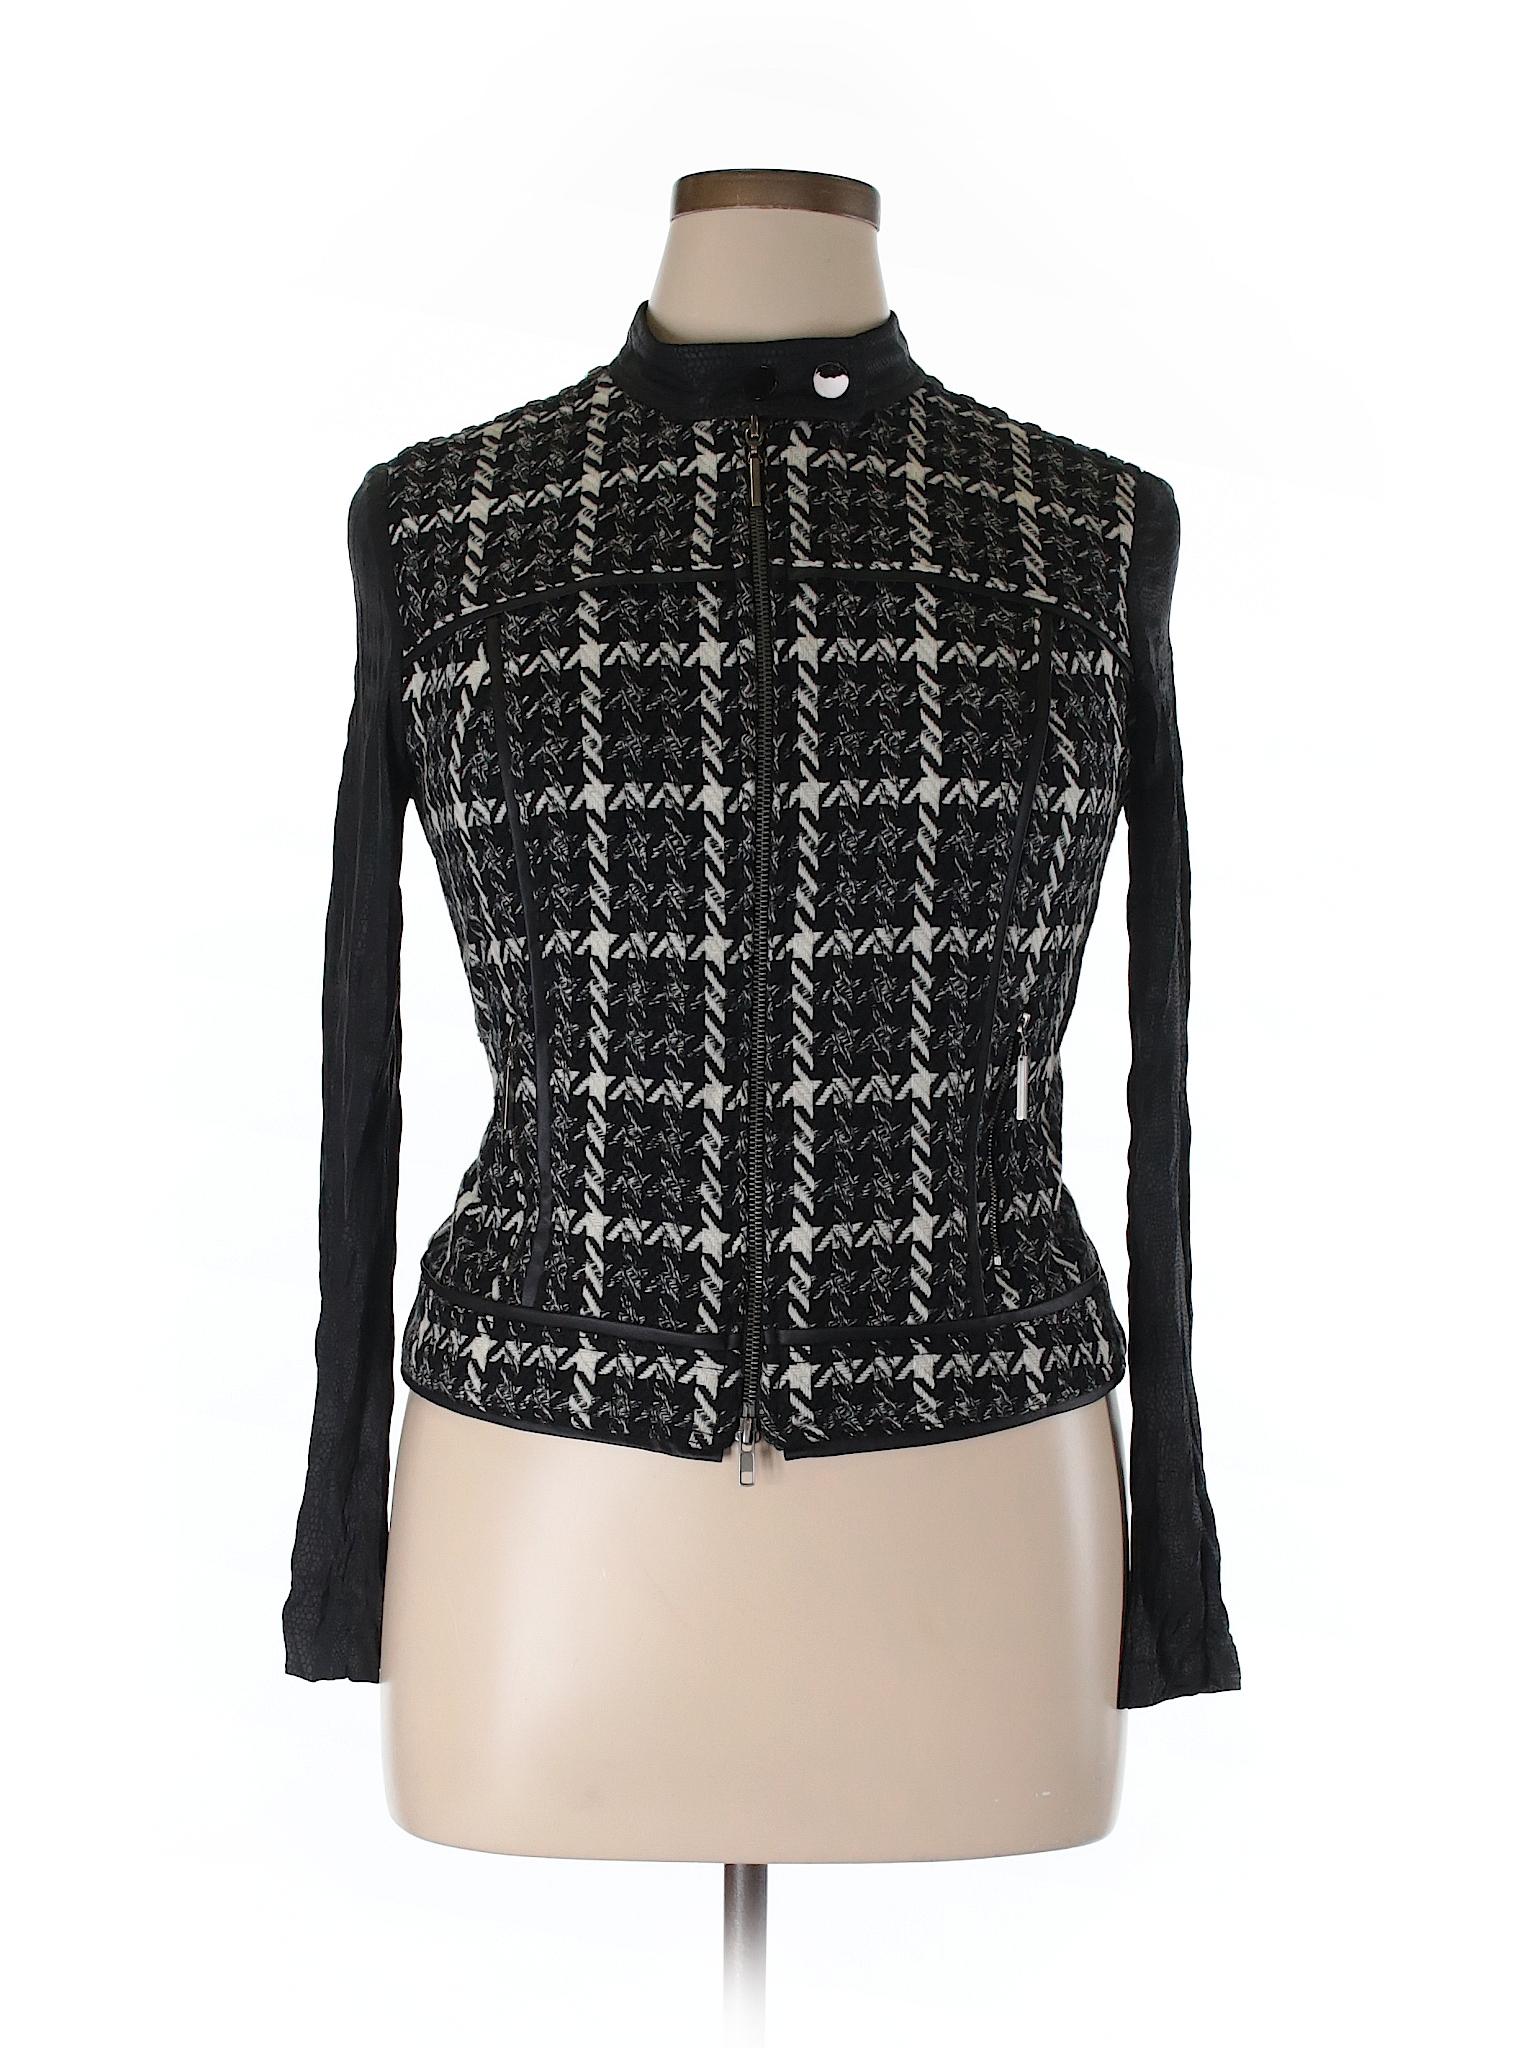 Boutique Jacket leisure Makali Alberto leisure Boutique 67xY6q